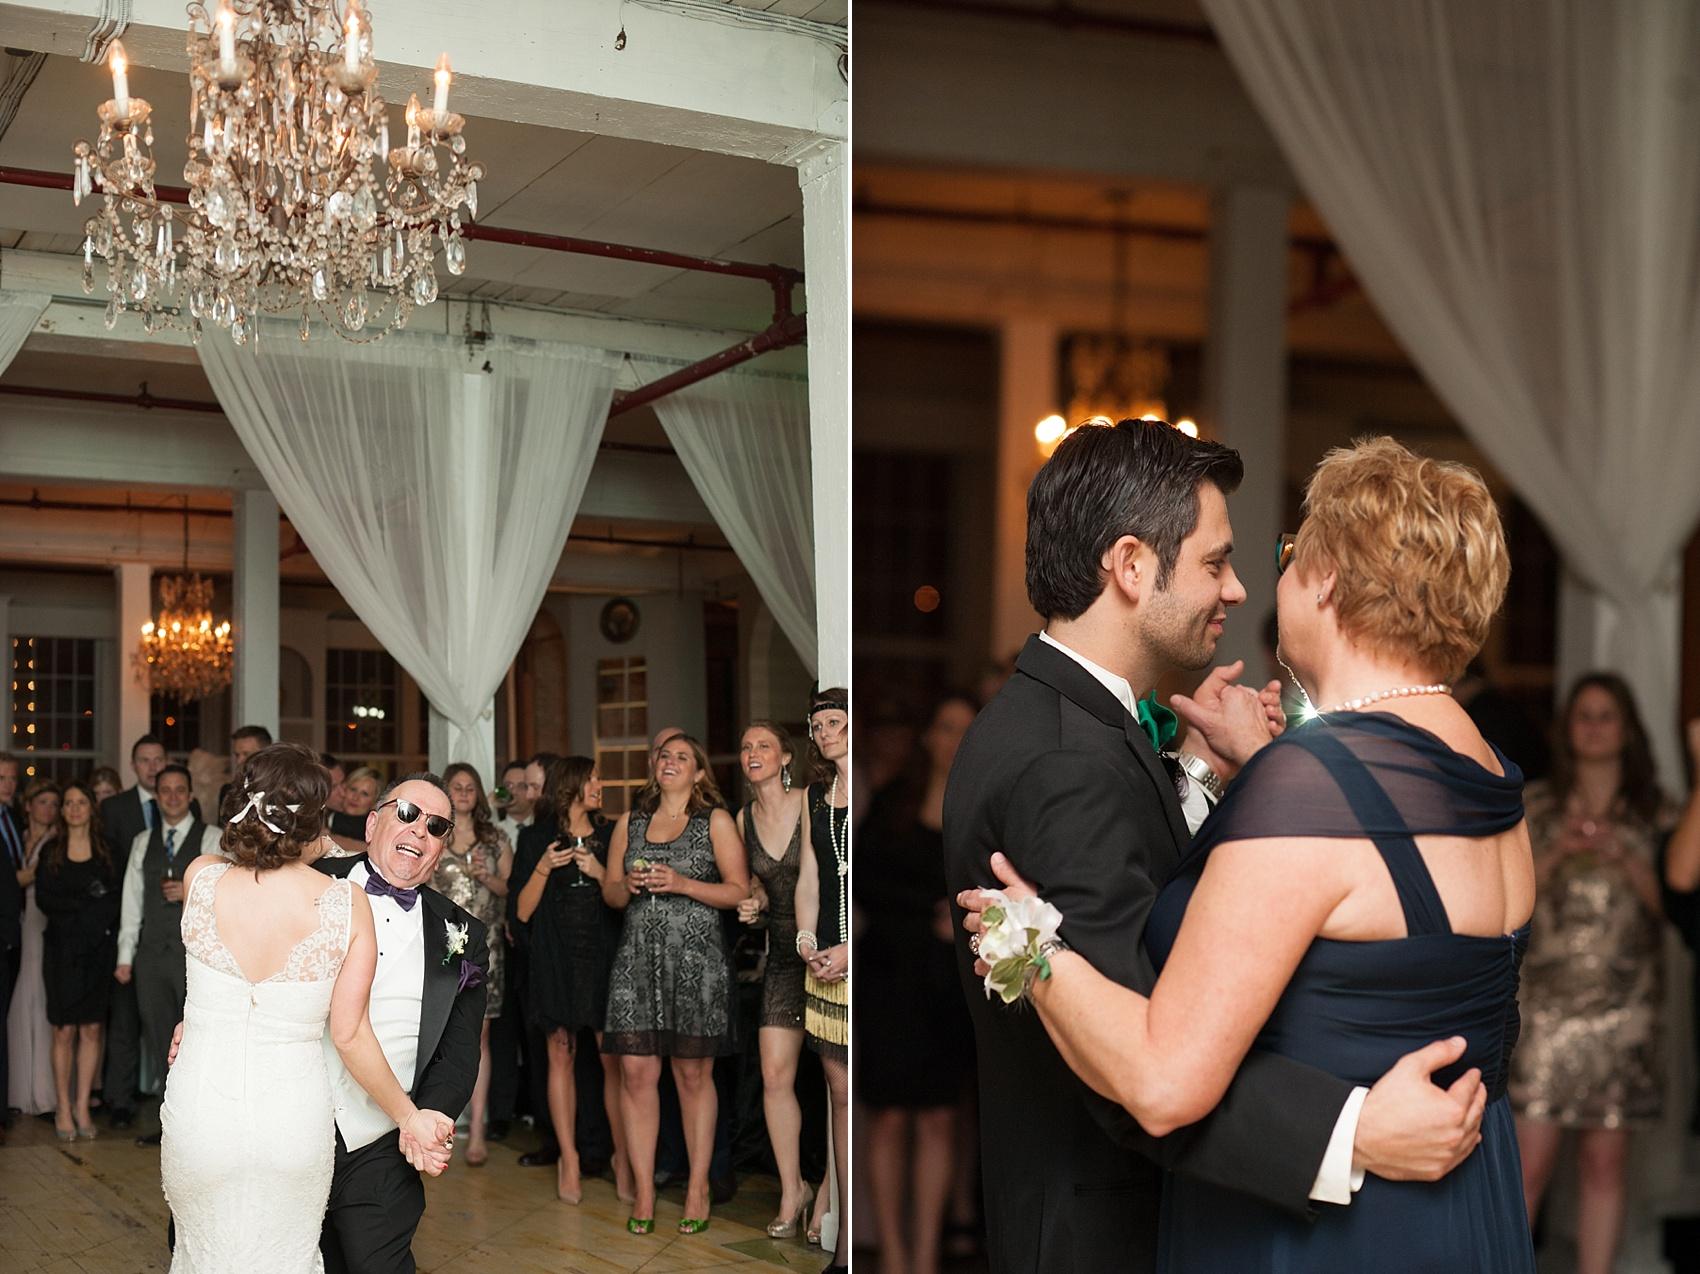 Parent dance at a vintage reception at the Metropolitan Building. Images by Mikkel Paige Photography.